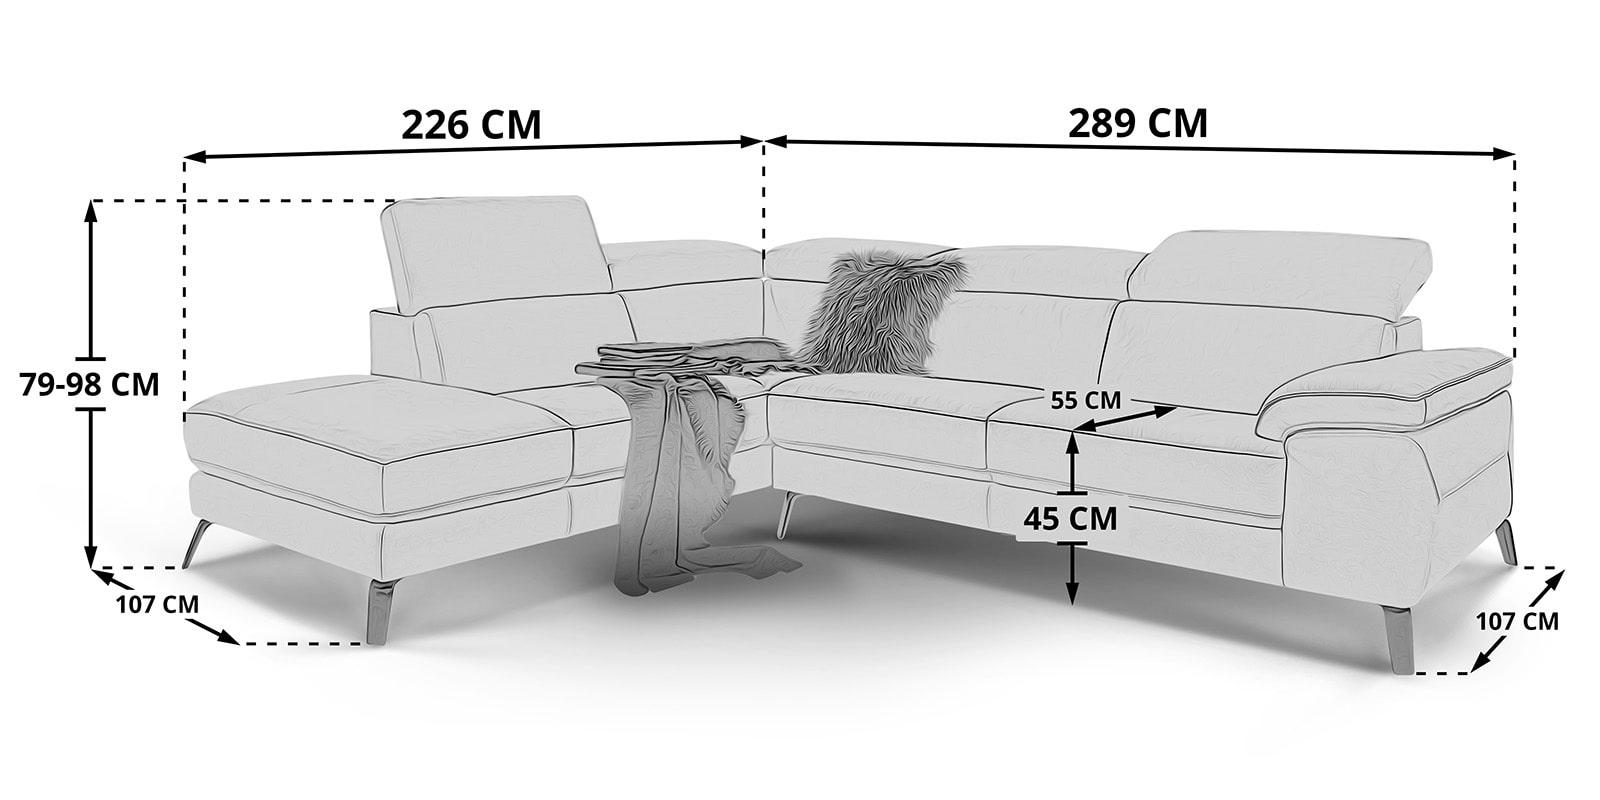 Moebella24 - Ecksofa - Gusti - Skizze - Maße - Leder - Spiegelverkehrt - Verstellbare - Kopfstützen -